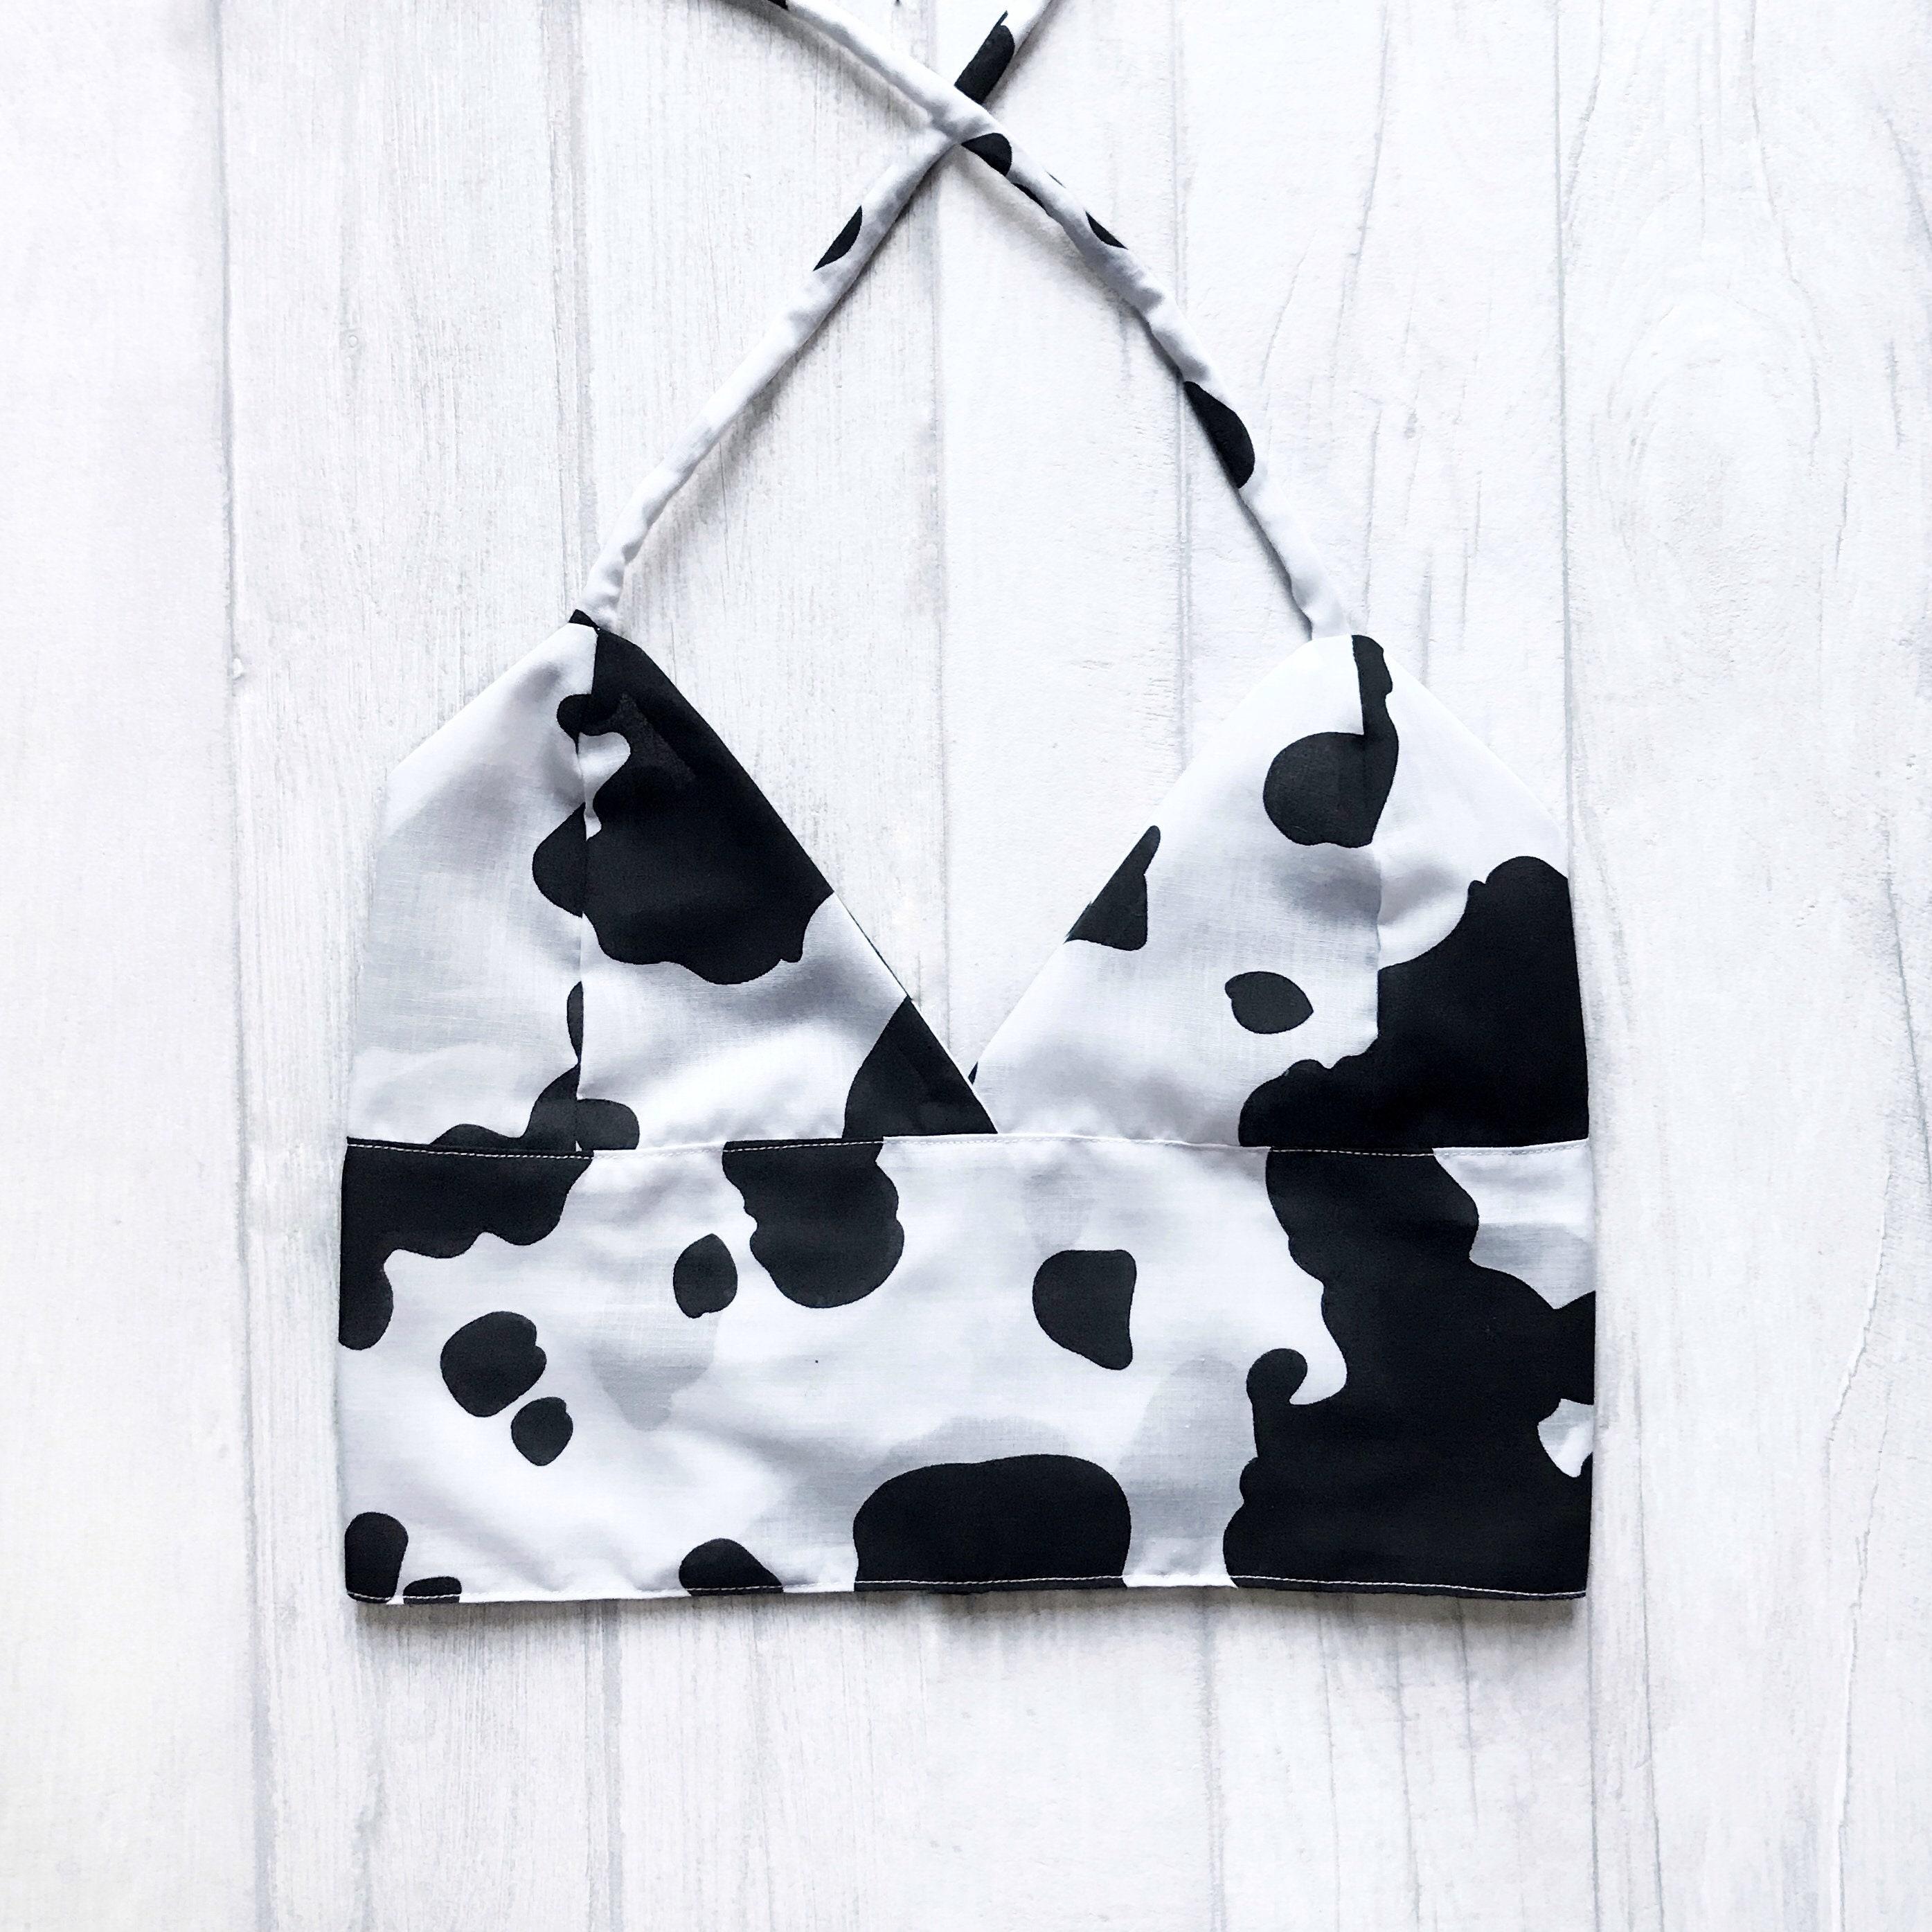 75ae3f509b25e Handmade cow print bralet uk sizes us custom cup etsy jpg 2790x2790 Cow  pattern bra